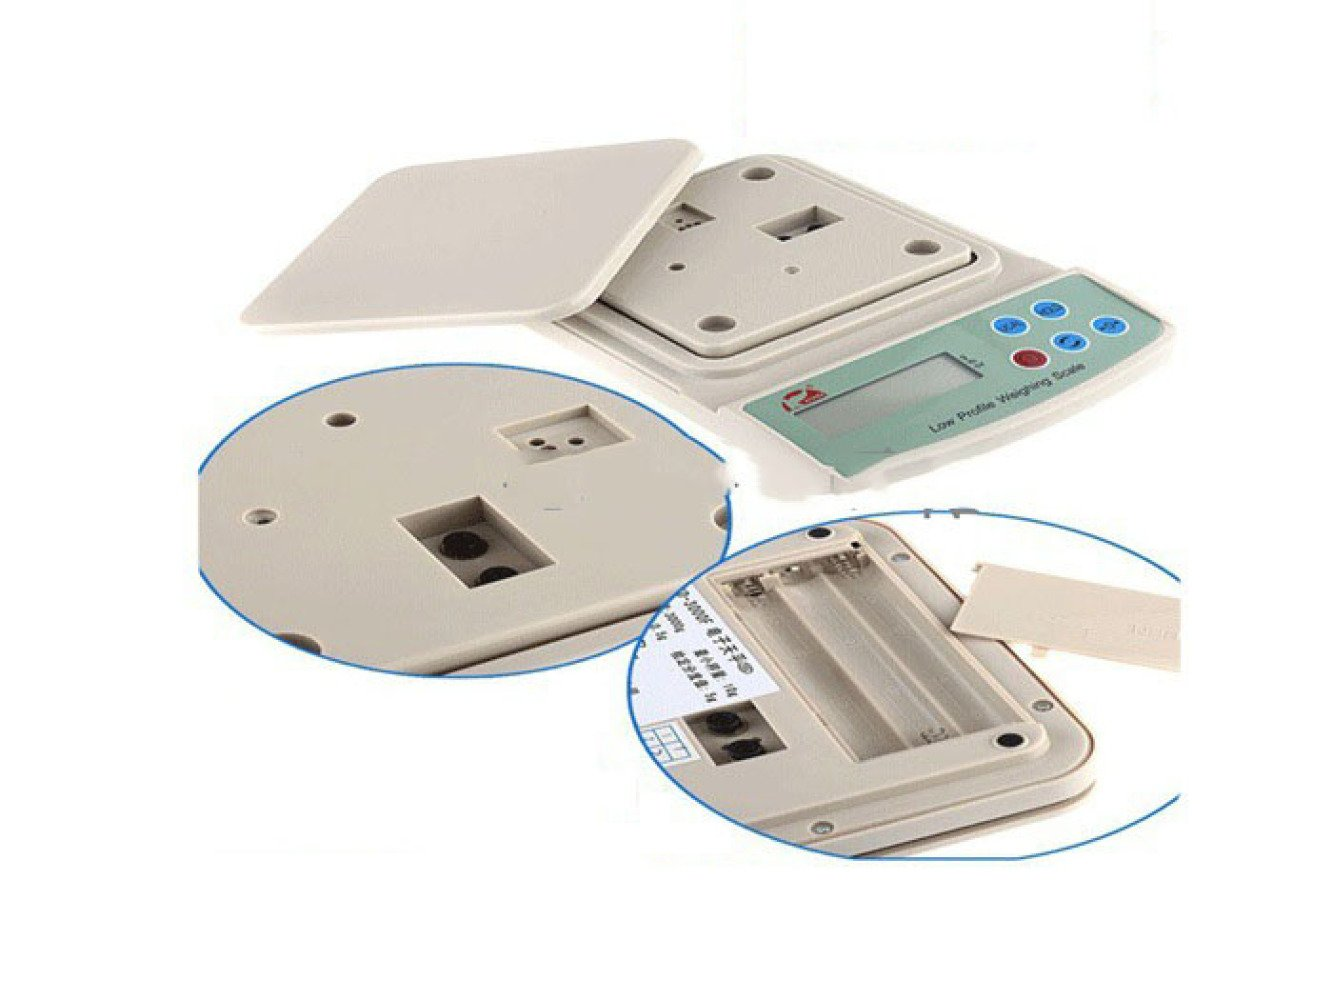 MLL Balanza electrónica de balanza de Cocina para Hornear Llamada Farmacia gramo Escala 500g / 0.1g joyería de Oro Llamada,300 Gramos: Amazon.es: Deportes y ...